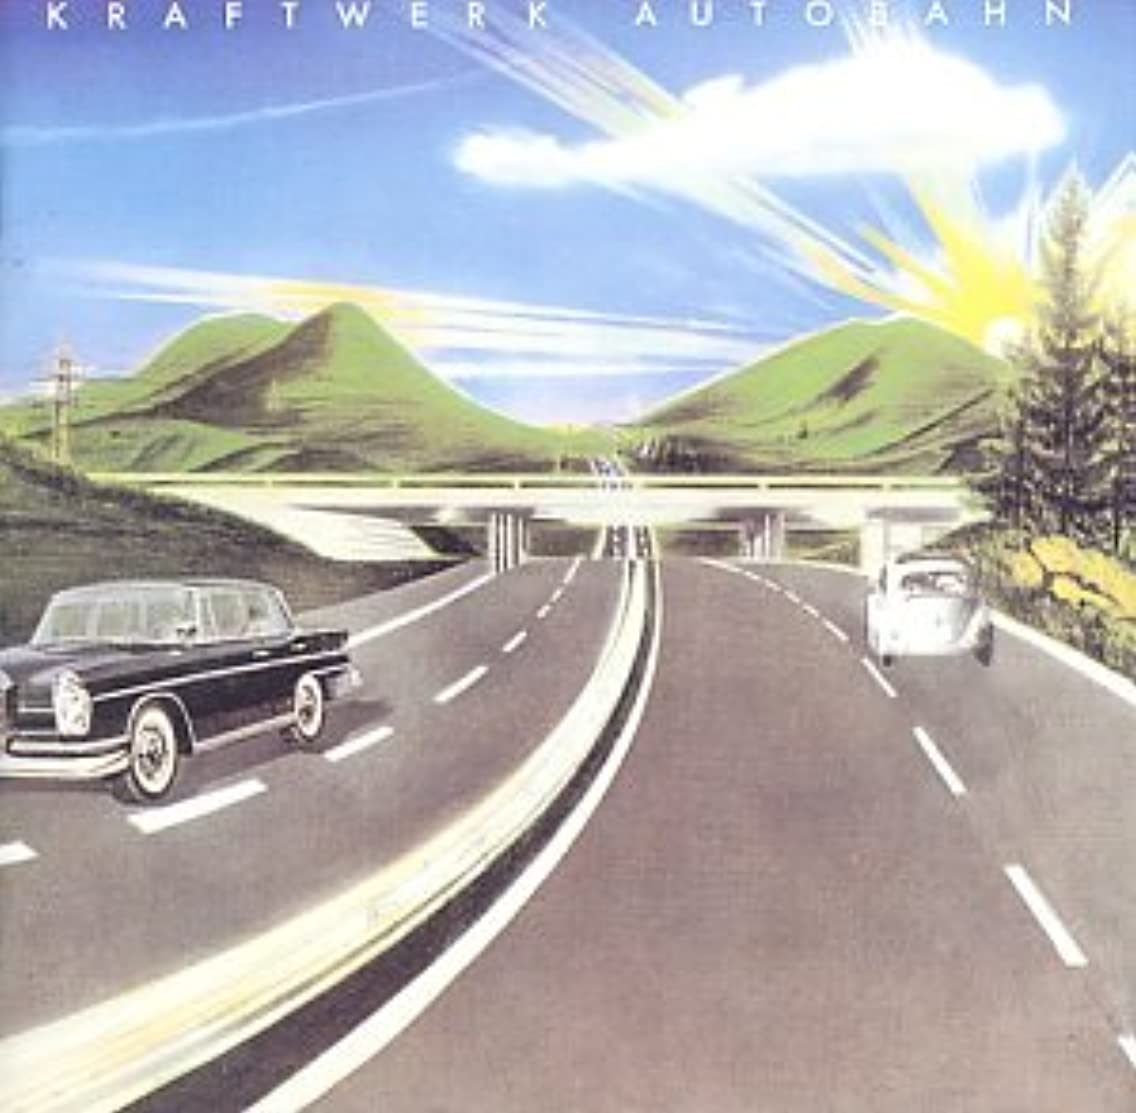 Autobahn Outburn